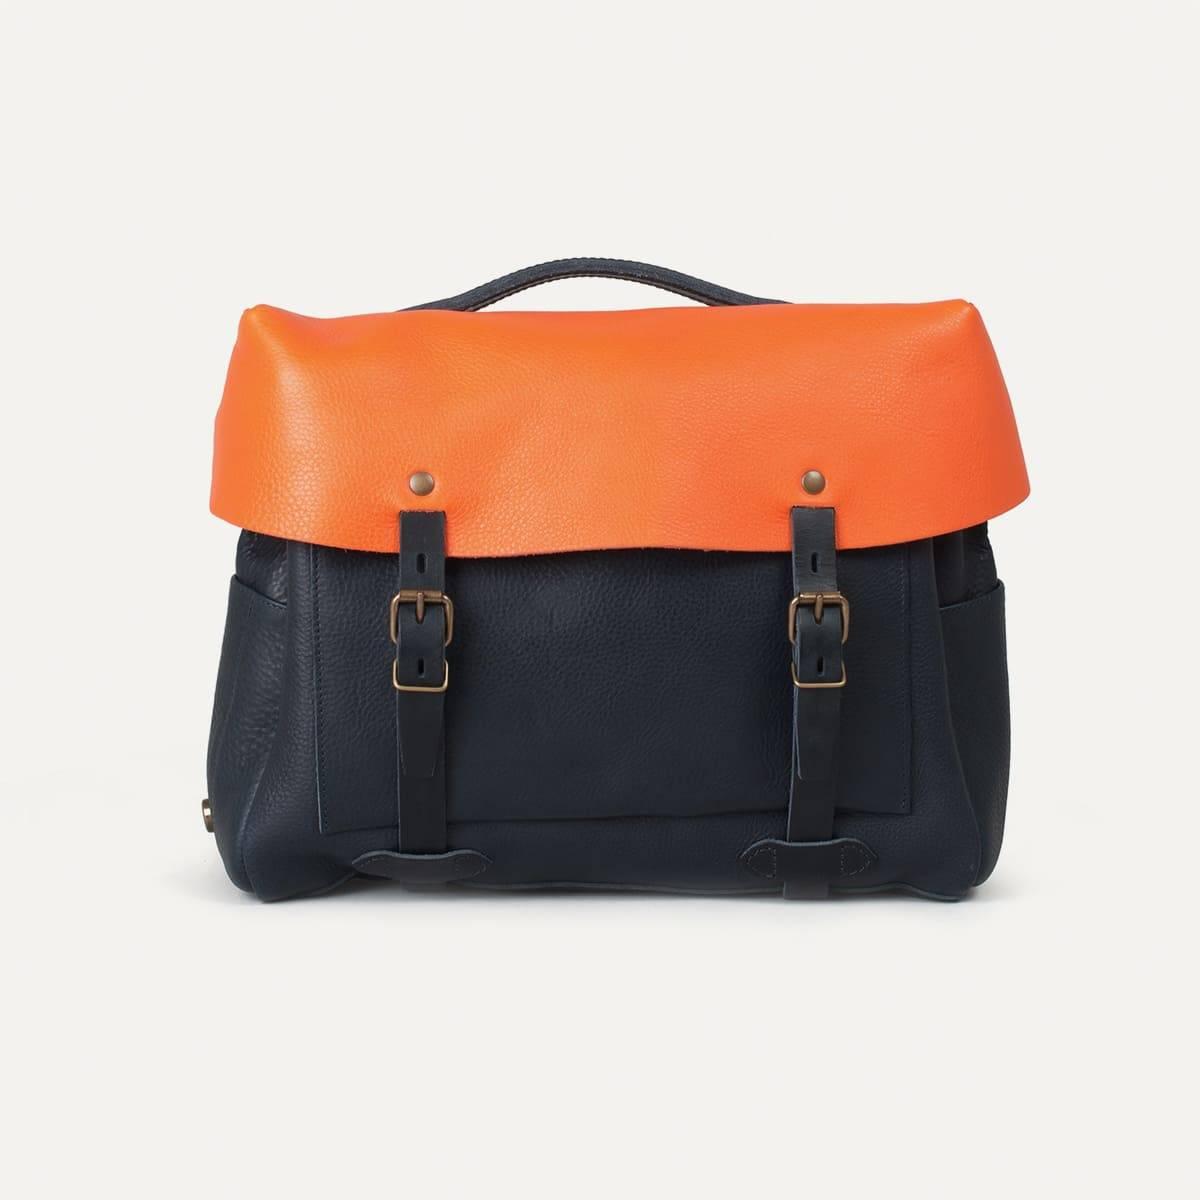 Sac Eclair Bleu de Chauffe x Blitz - Navy/Orange (image n°3)